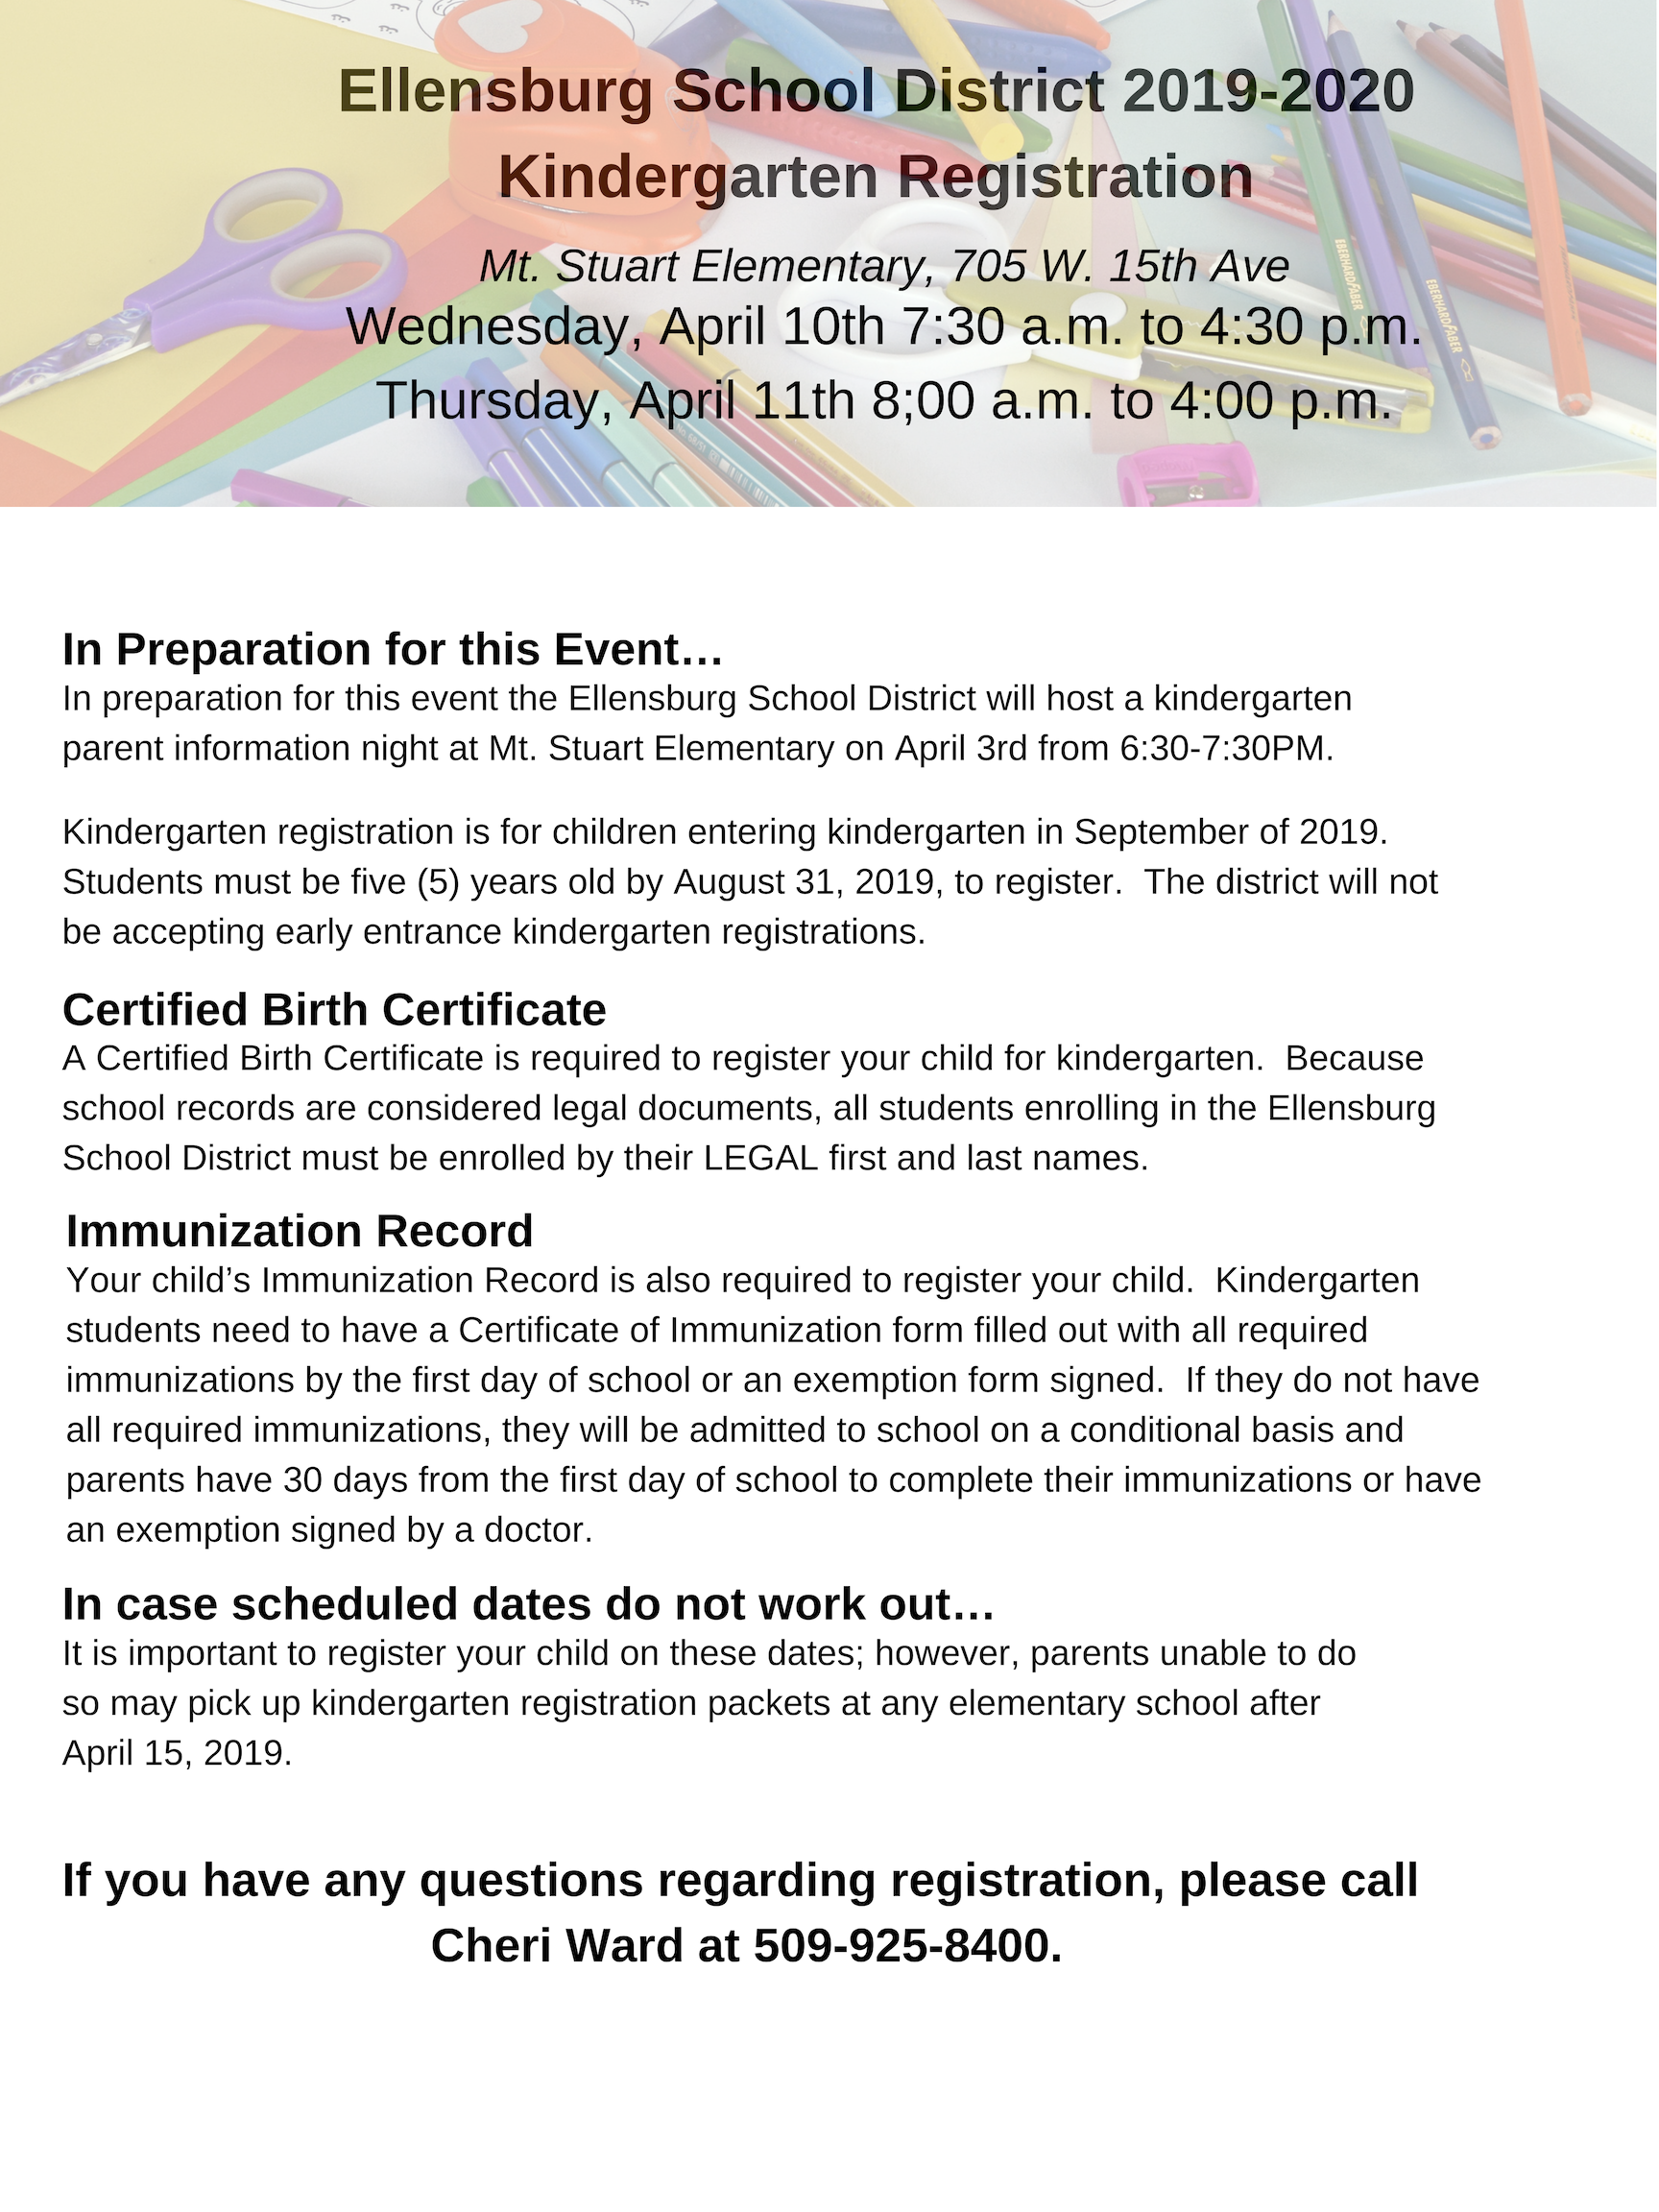 District 6 Kindergarten Registration | Kinder intended for North Clackamas School District Elementary Calen